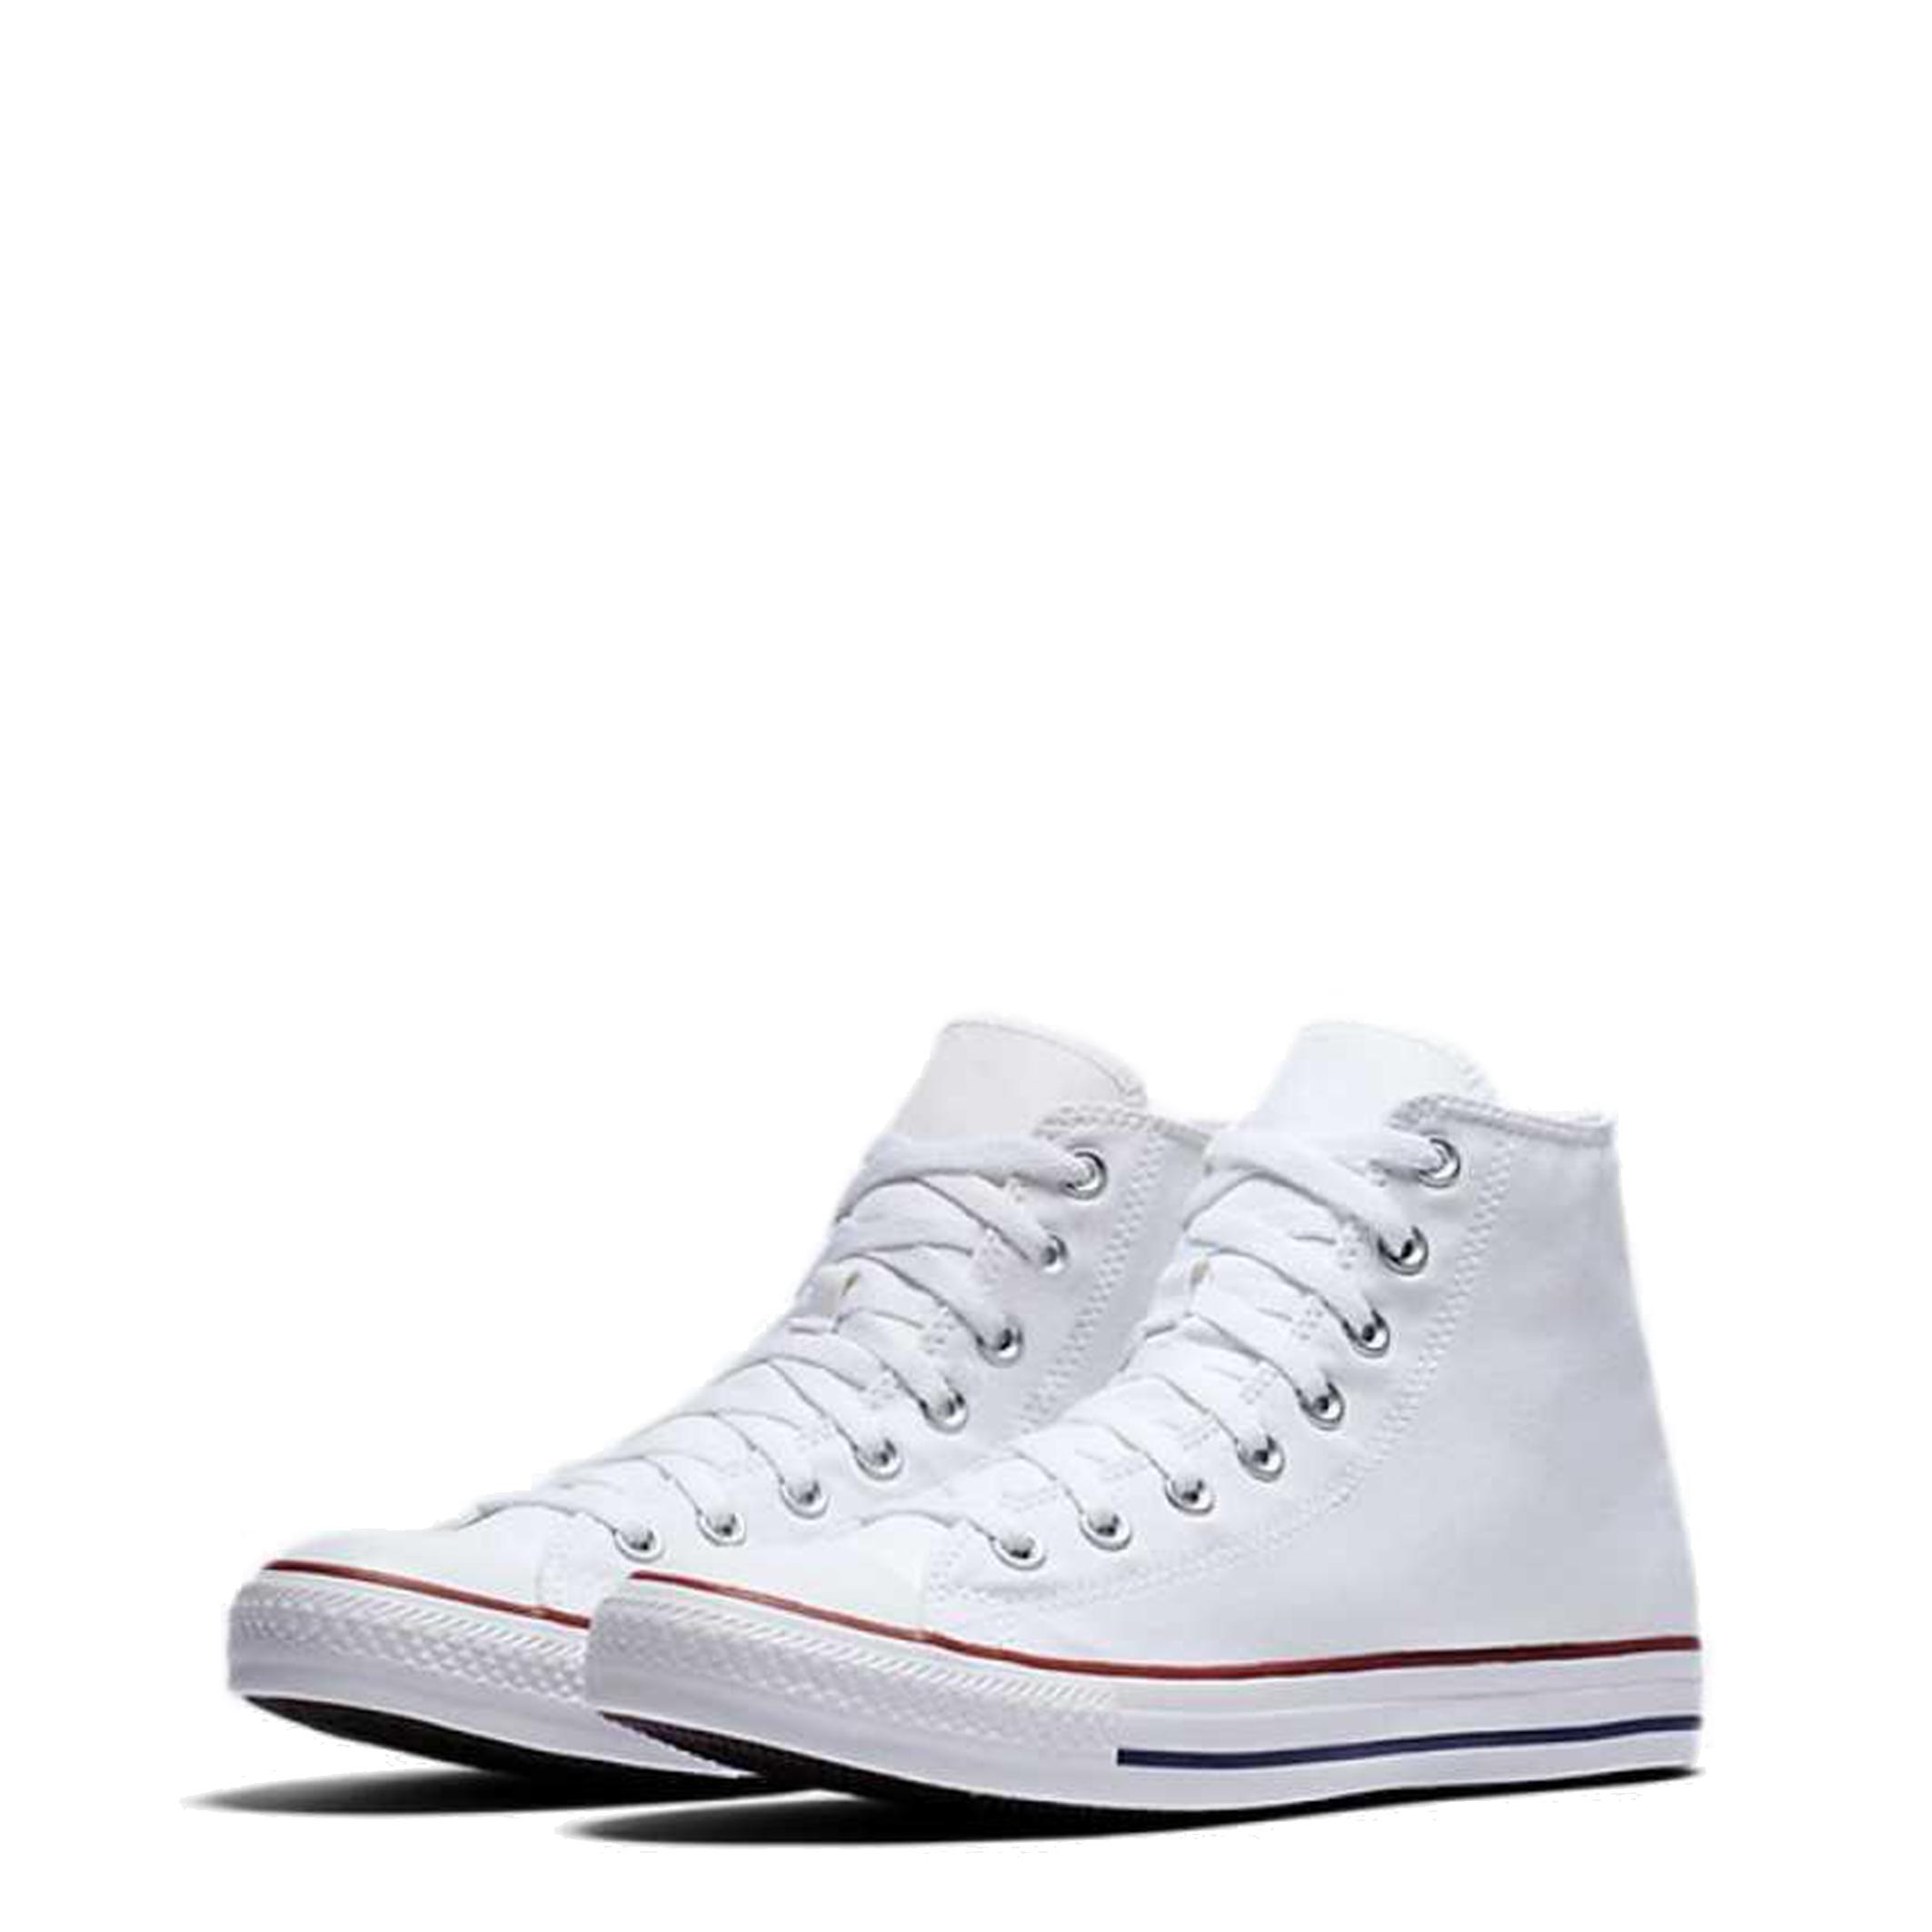 Baskets / Sport  Converse M7650 white